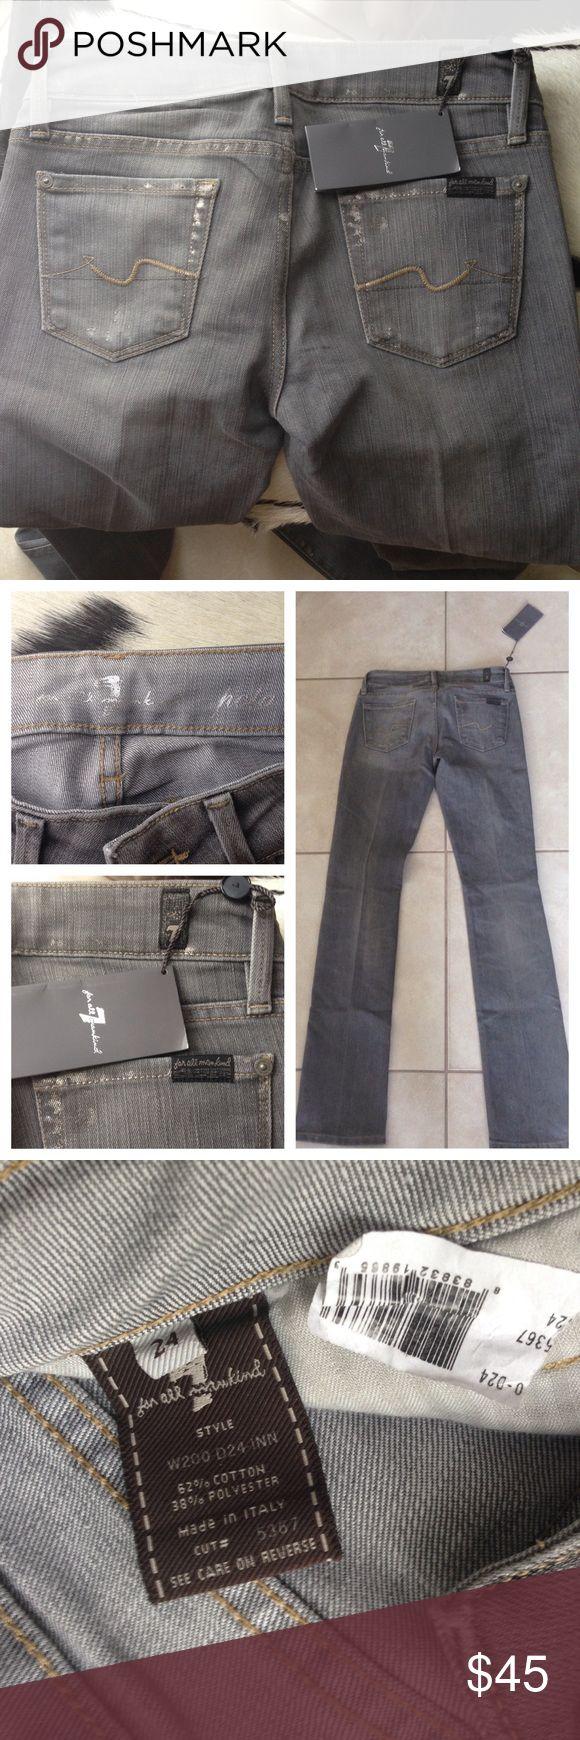 Seven jeans Seven jeans Seven7 Jeans